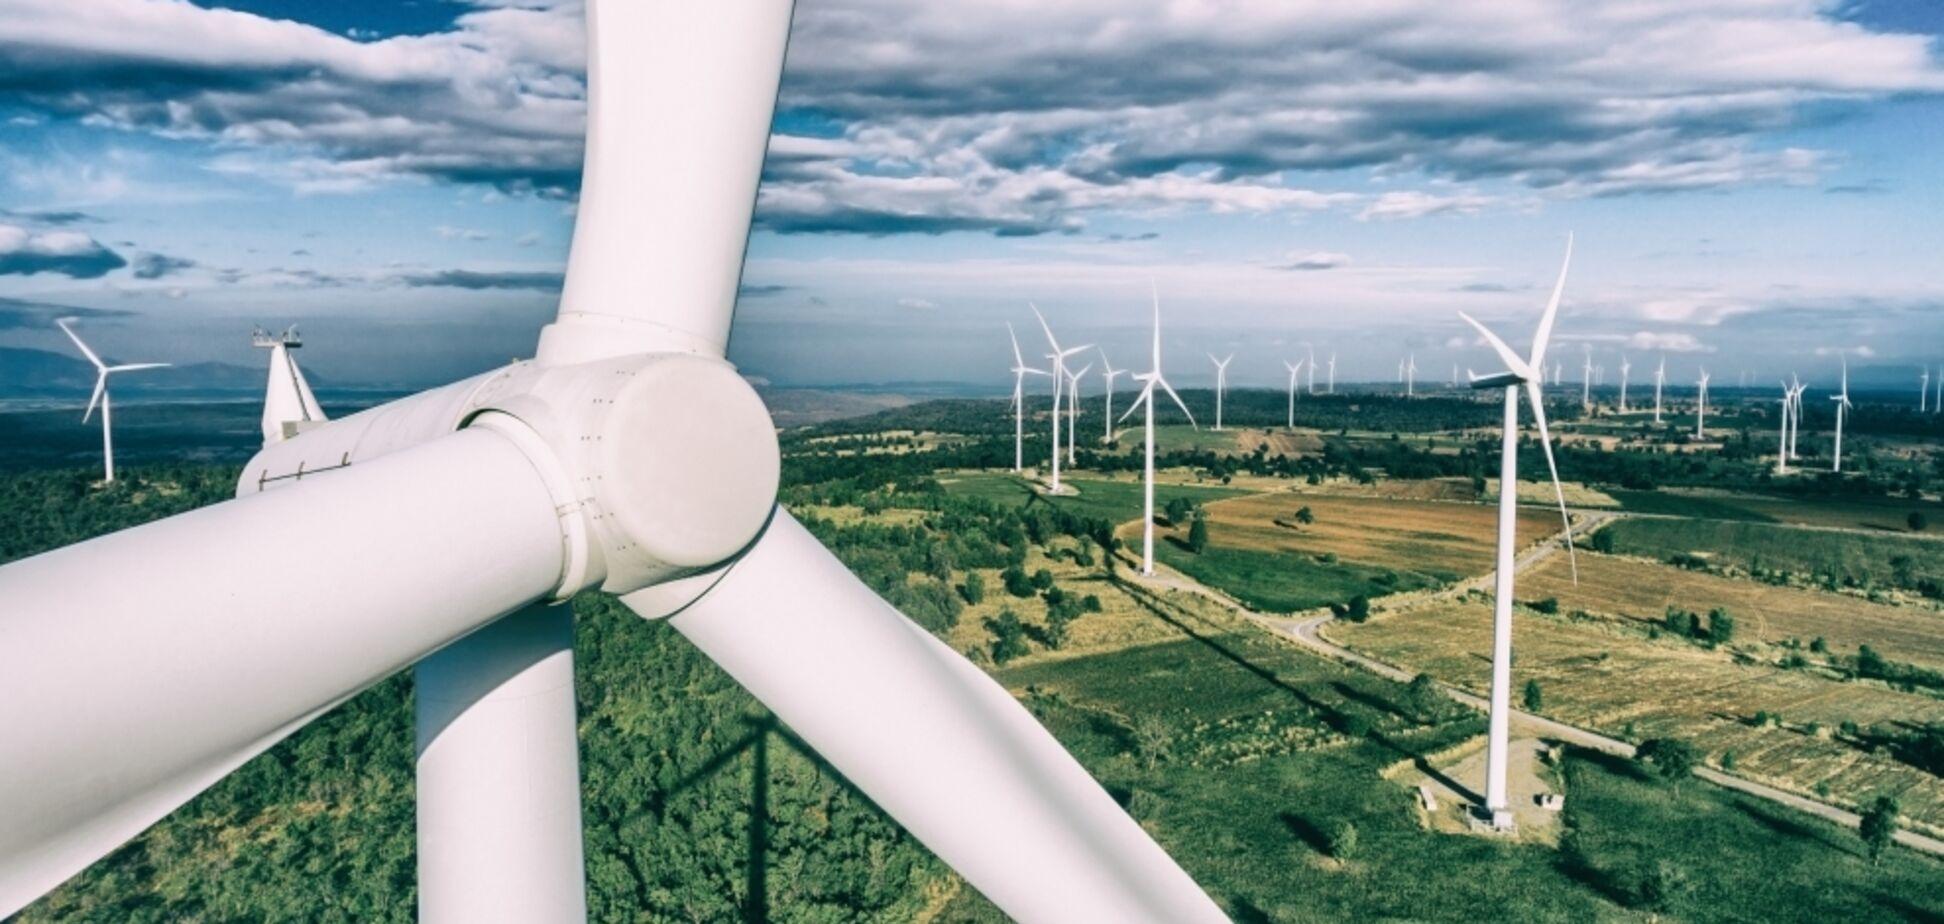 Переход стран мира на 'зеленую' энергетику: озвучена цена вопроса